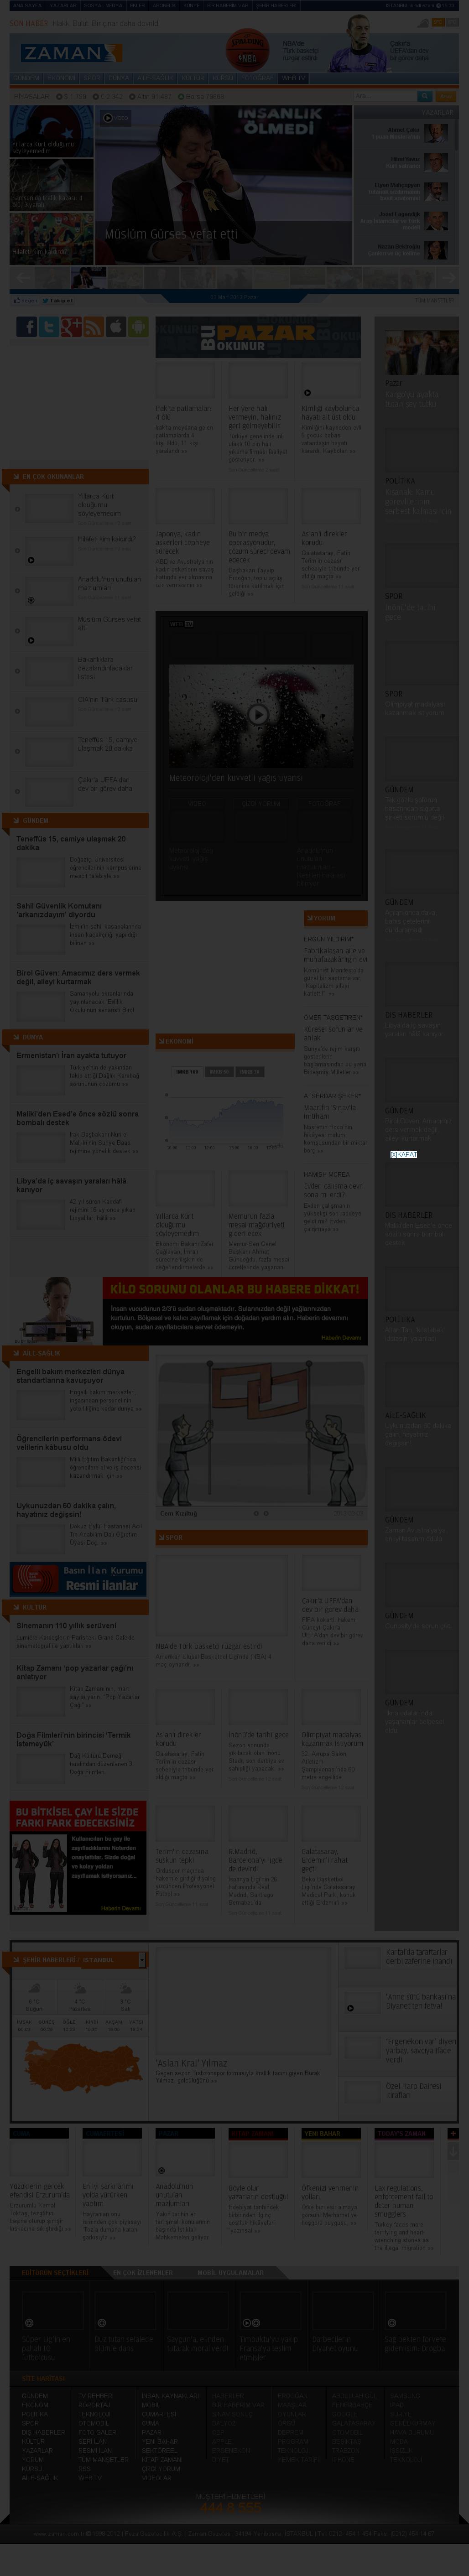 Zaman Online at Sunday March 3, 2013, 12:24 p.m. UTC